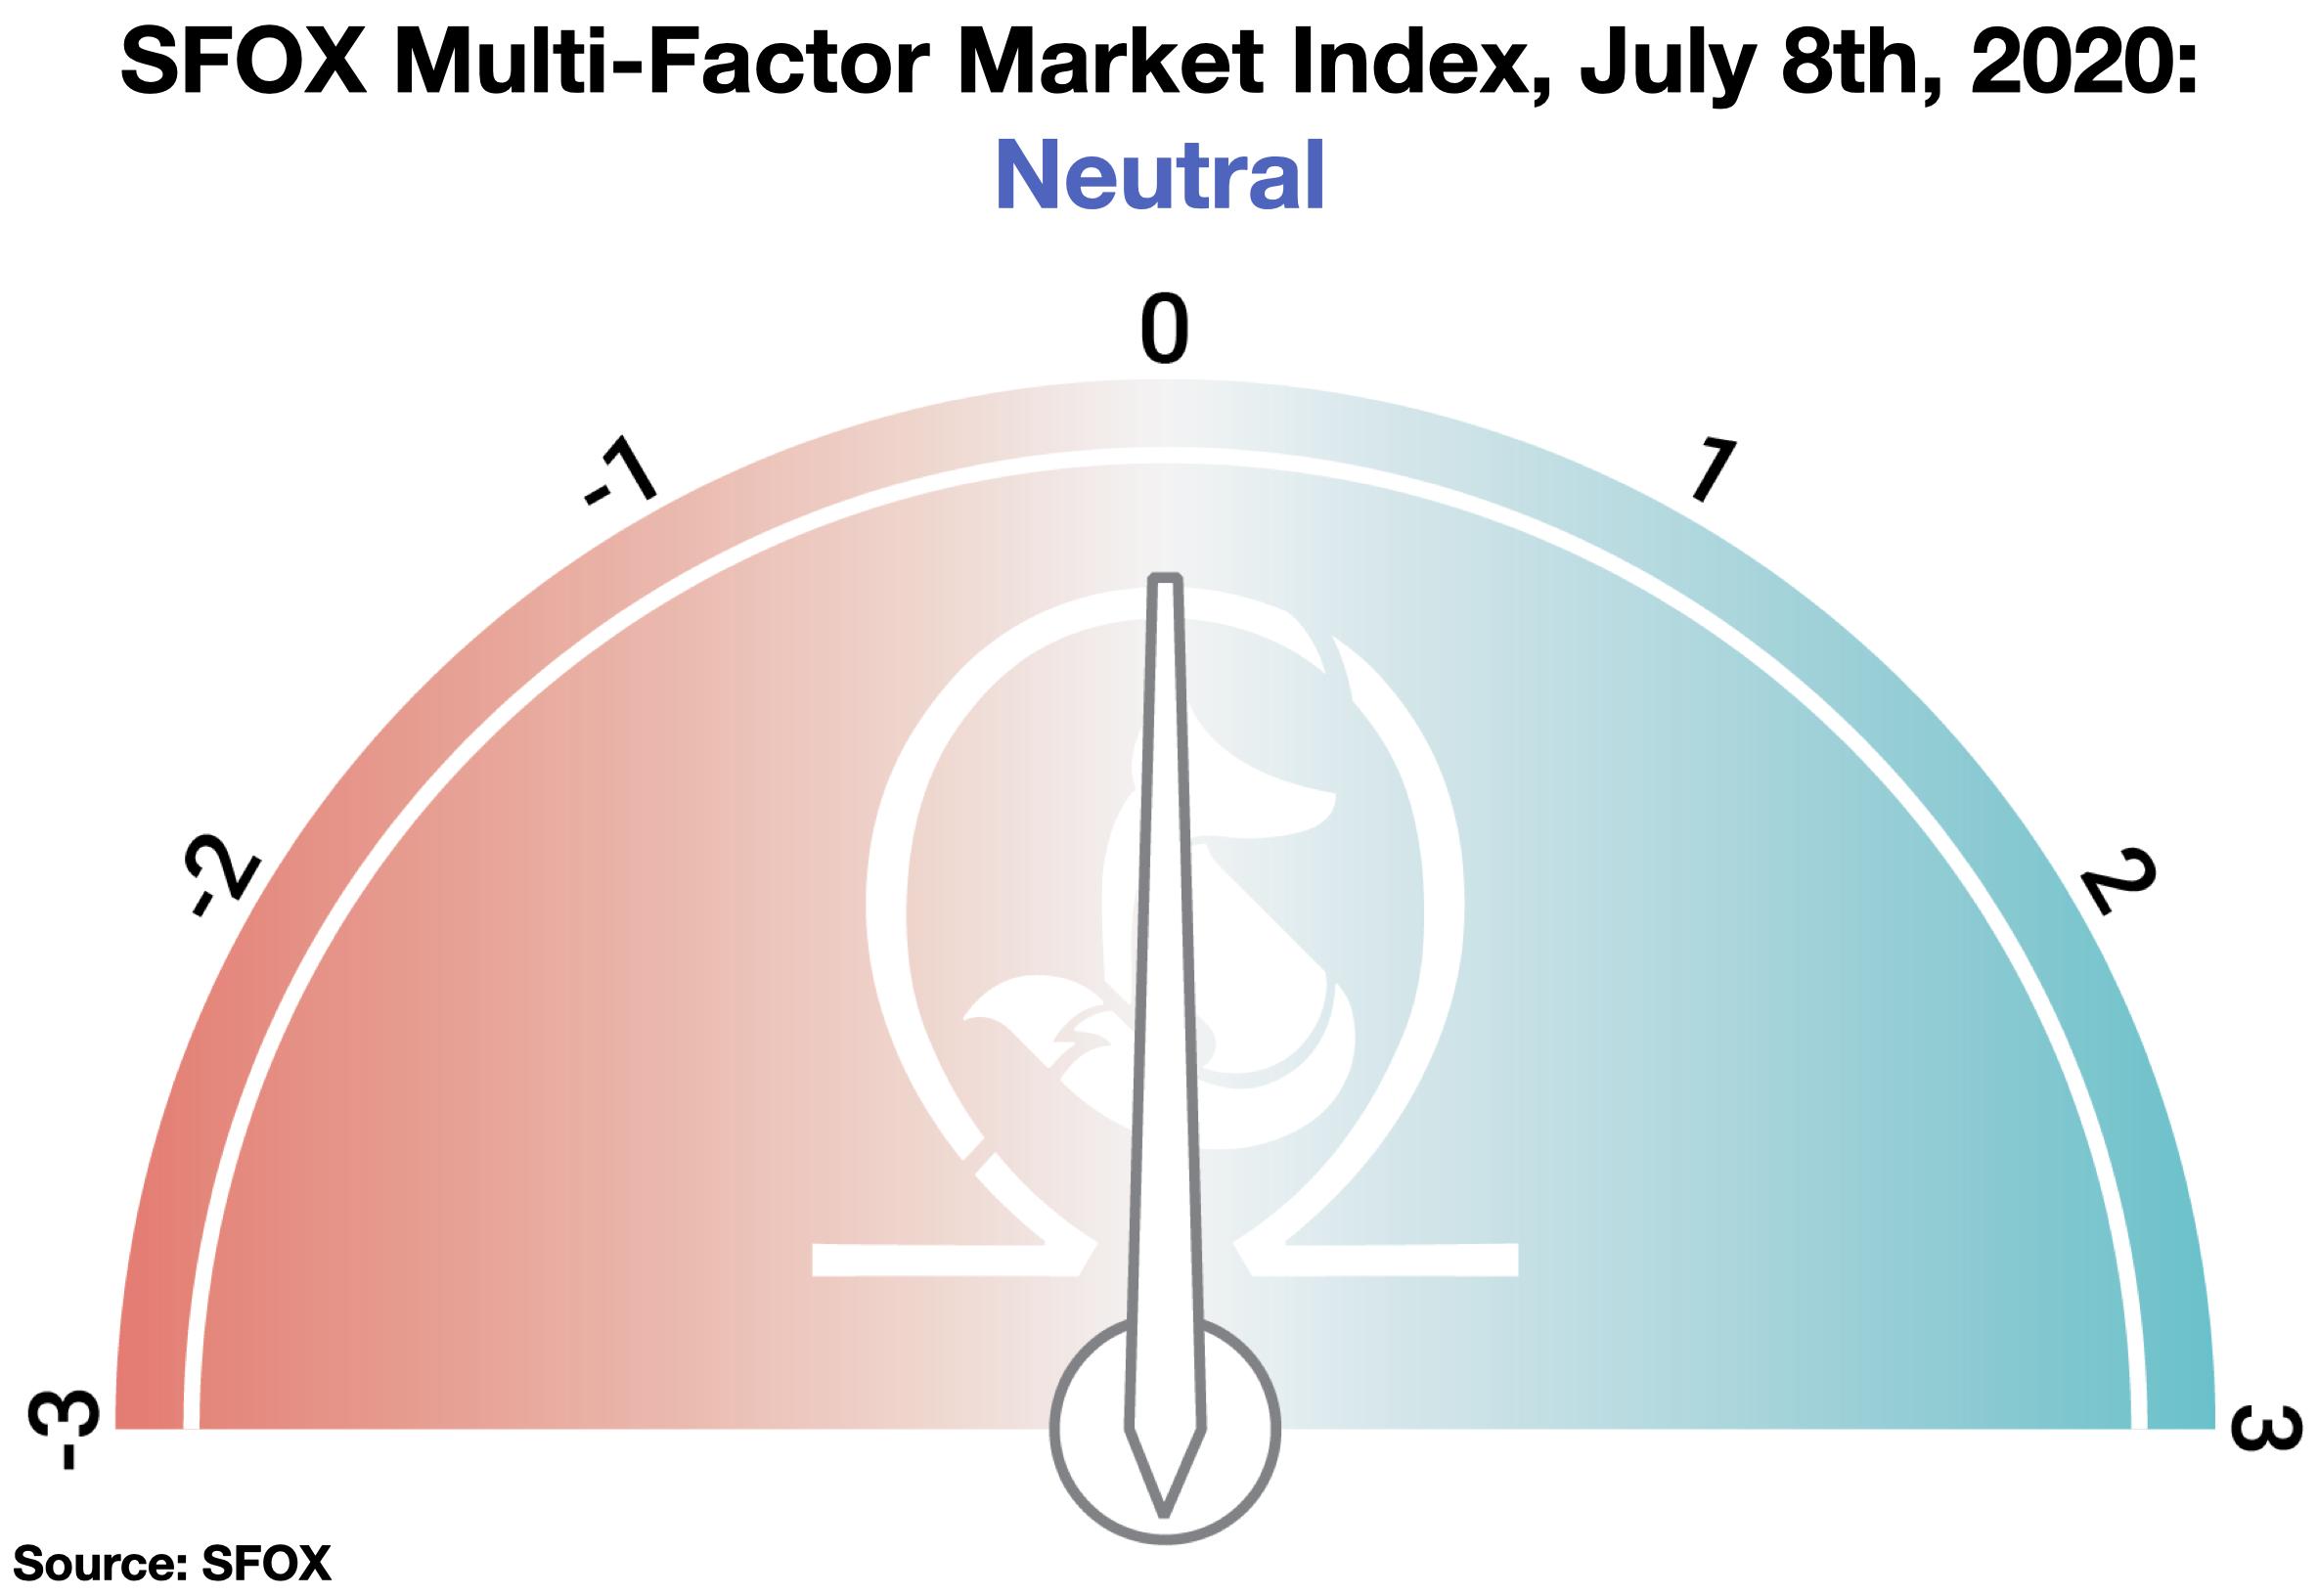 SFOX Multi-Factor Crypto Market Index, July 2020: Neutral.